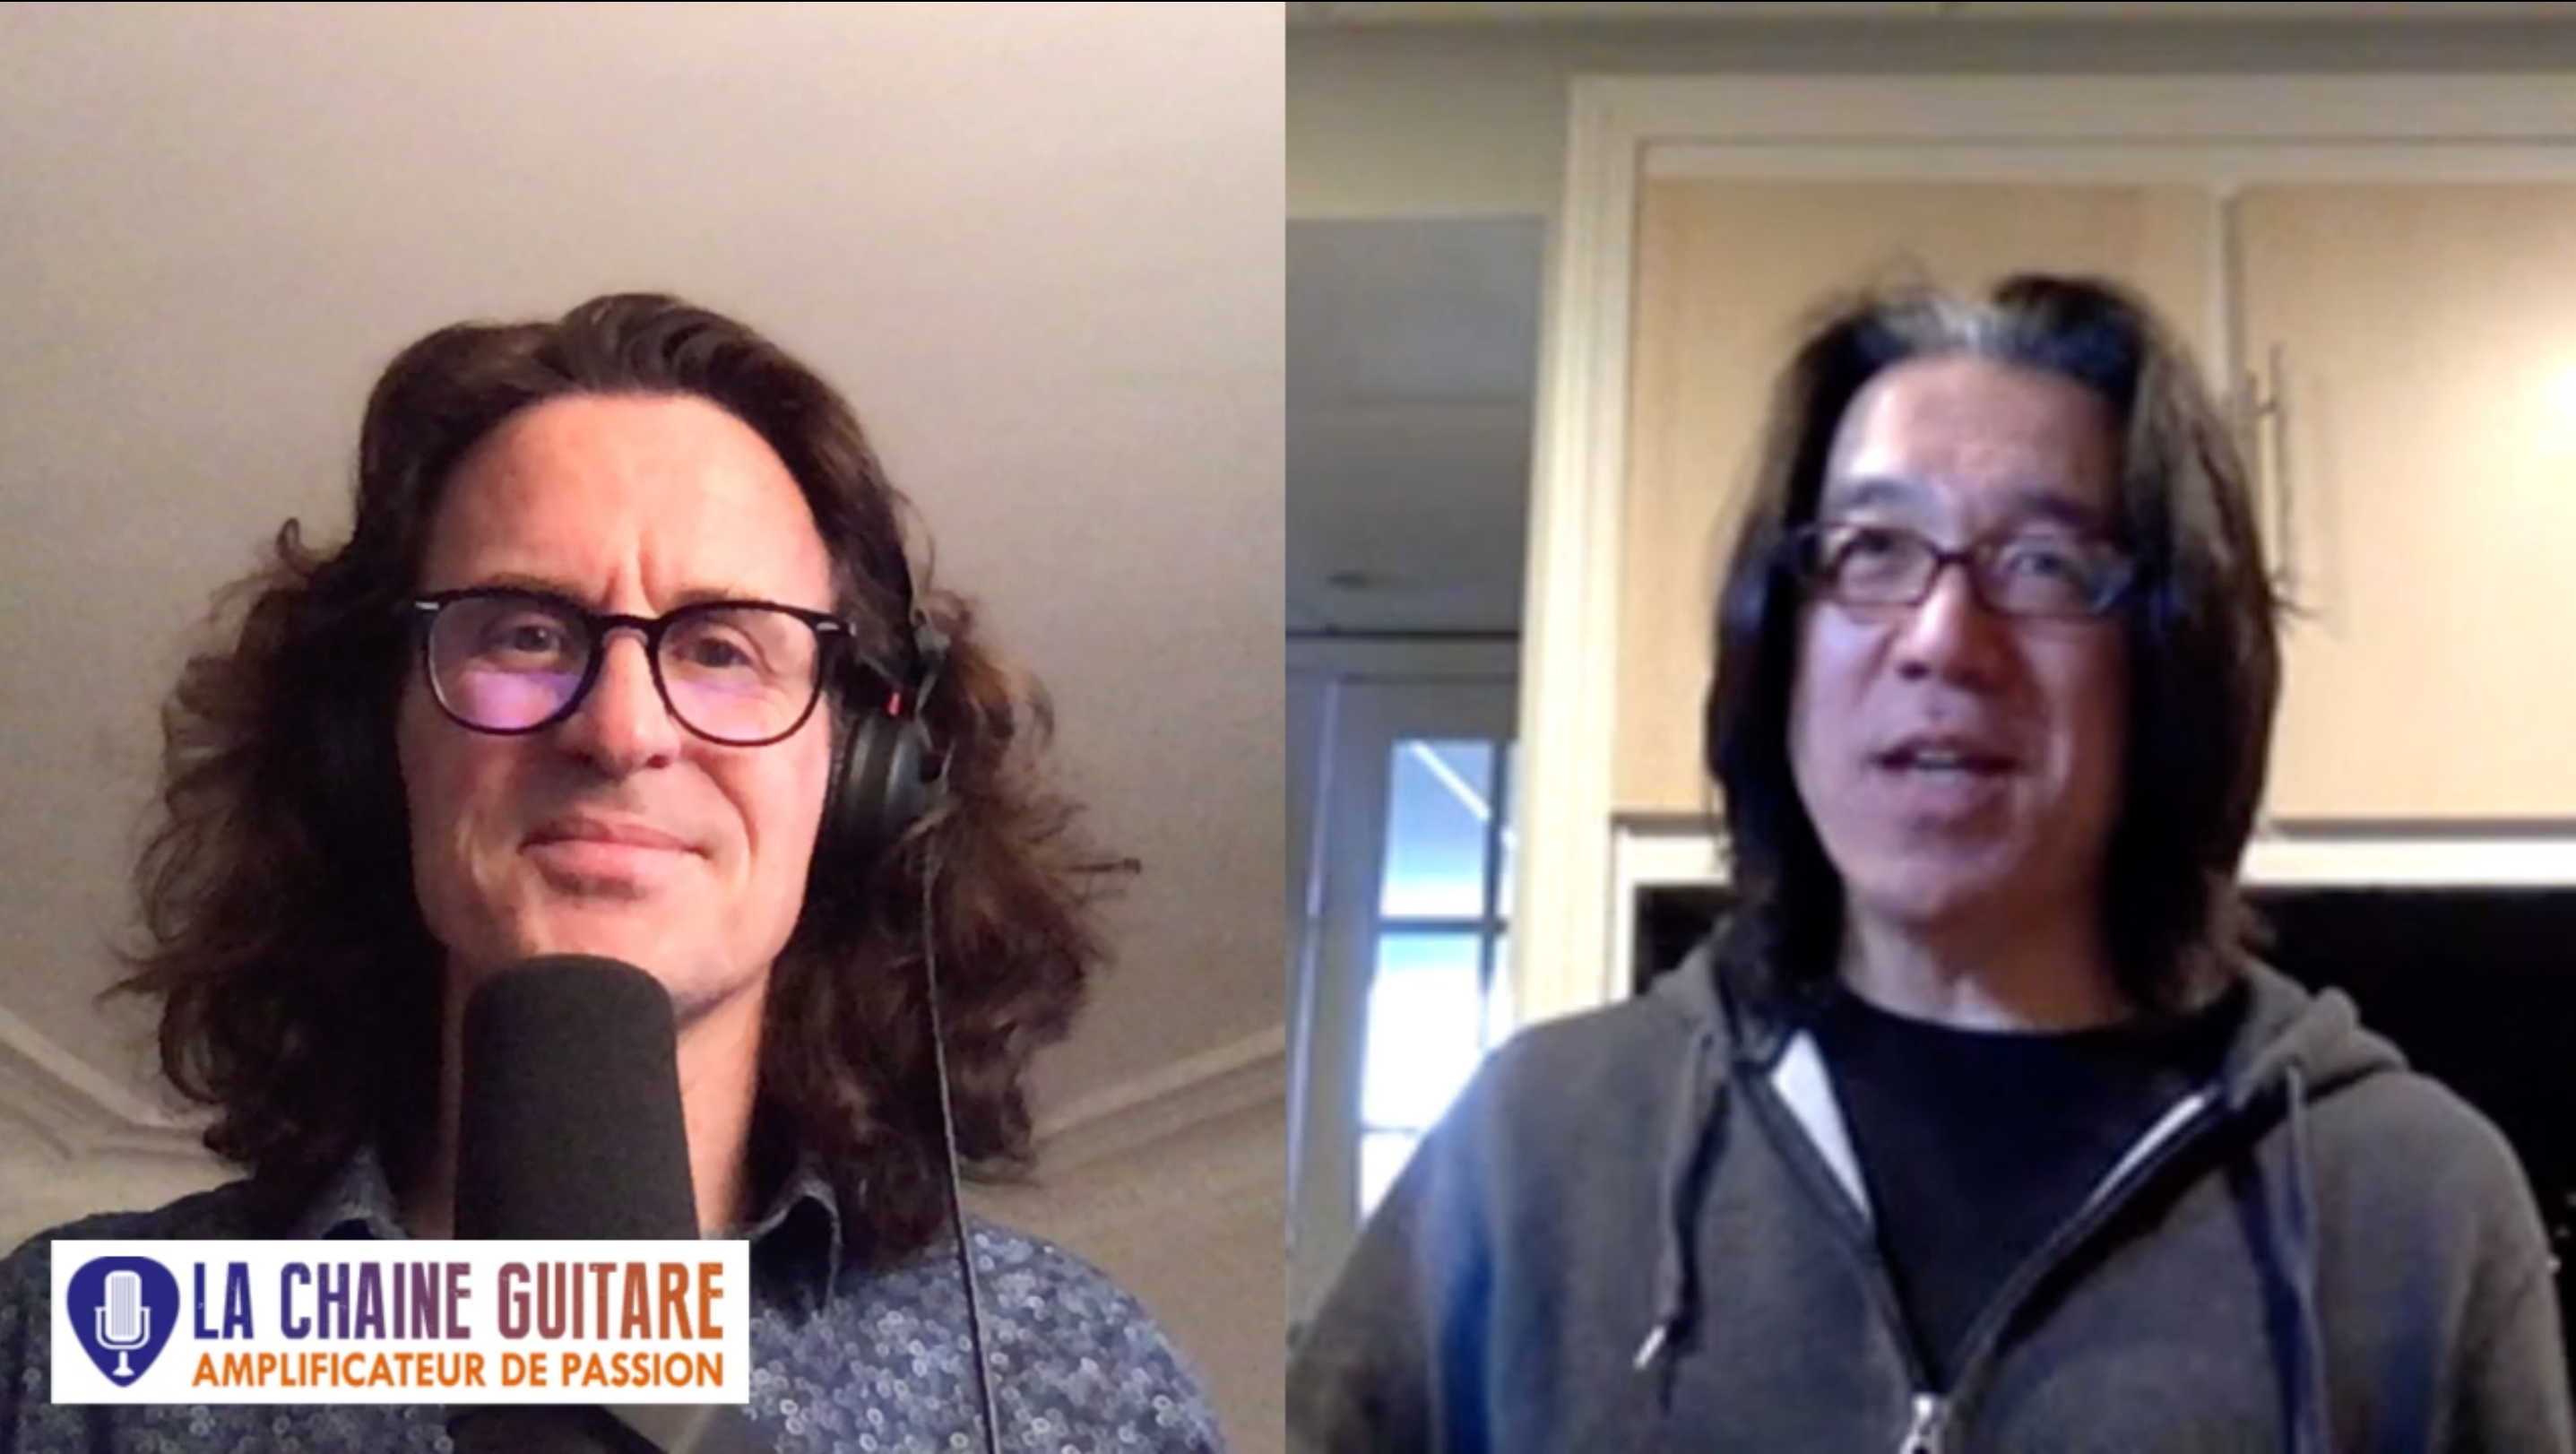 Tomo Fujita professional guitar player and teacher lockdown interview